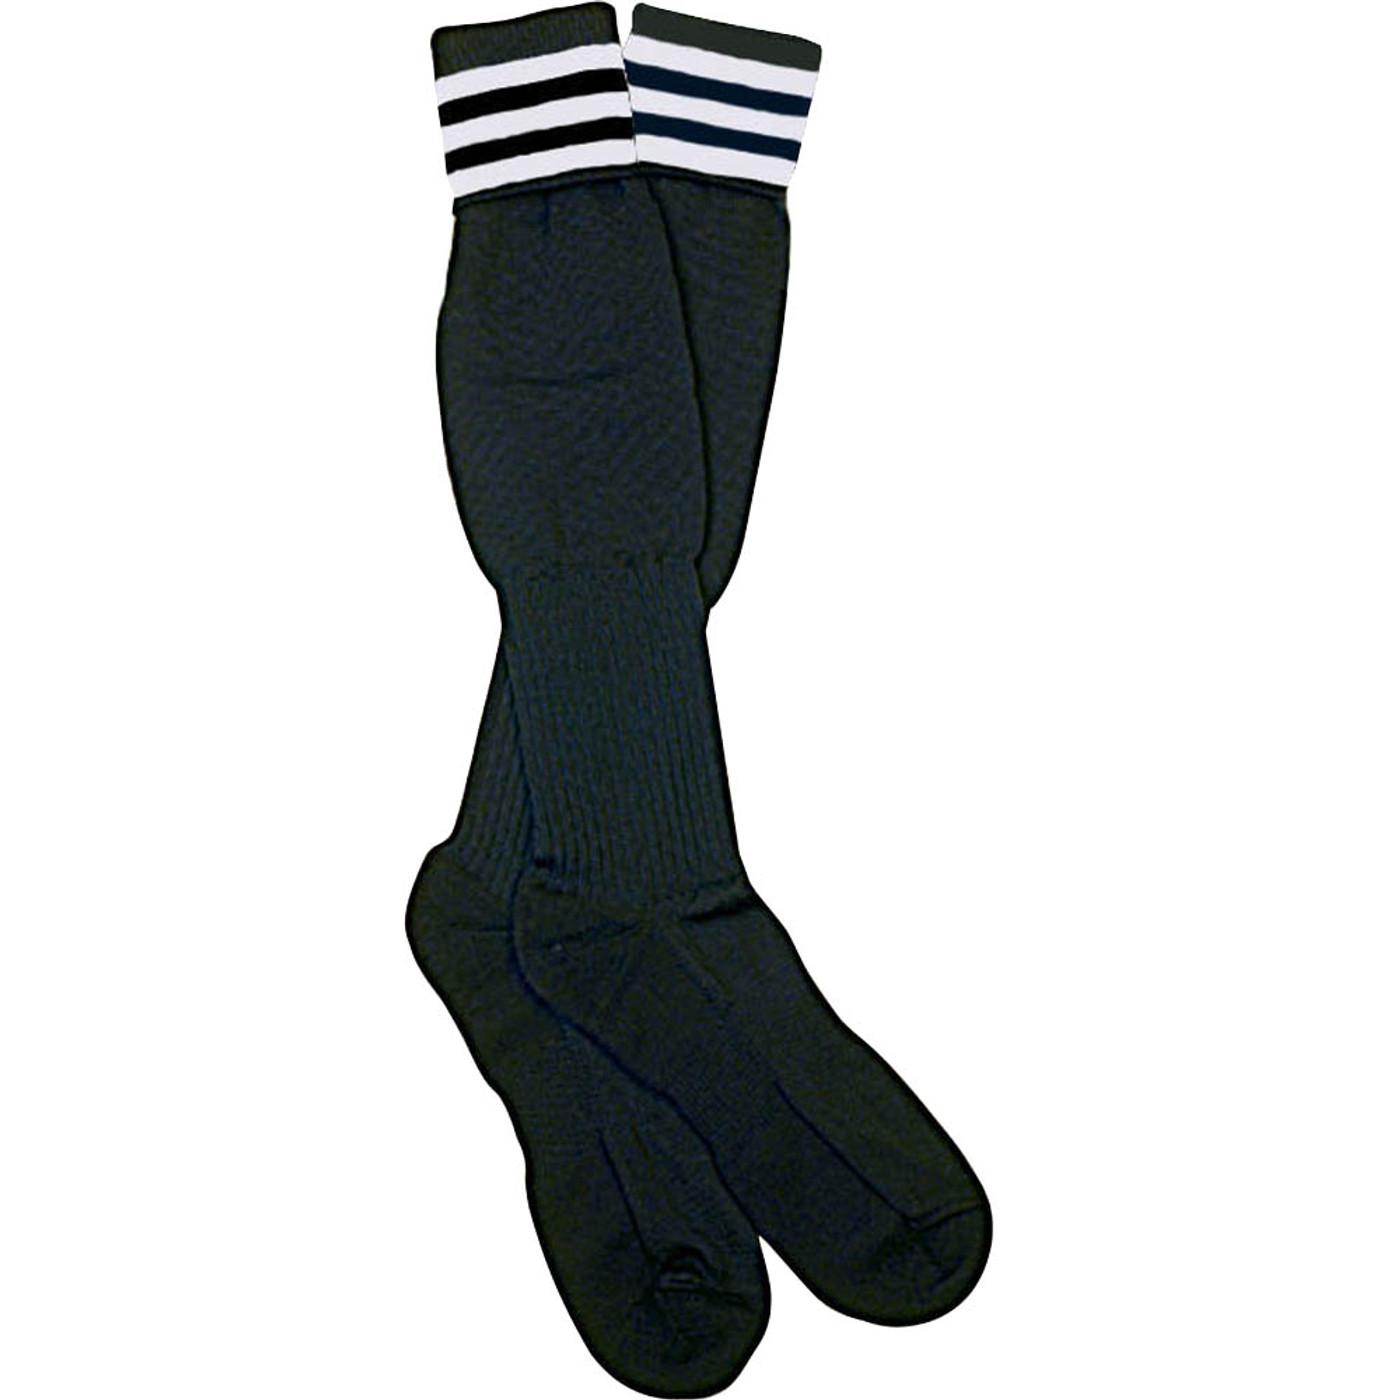 1309 The Italian Ref Sock, White Stripe